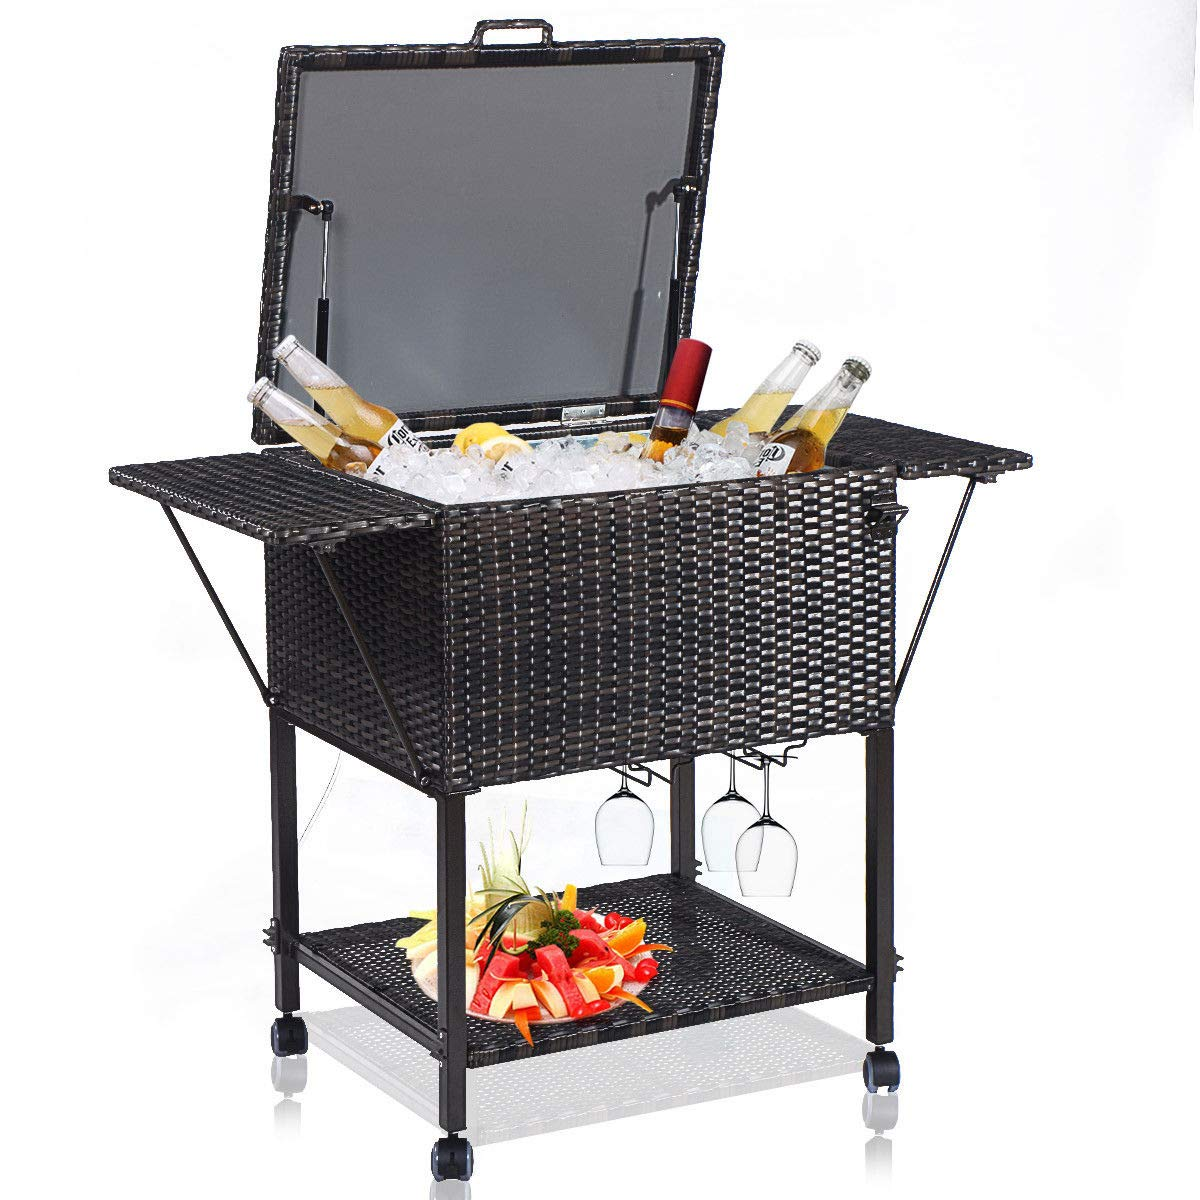 Giantex HW51578 108 Quart Rattan Cart Portable Wicker Cooler Trolley, Mix Brown by Giantex